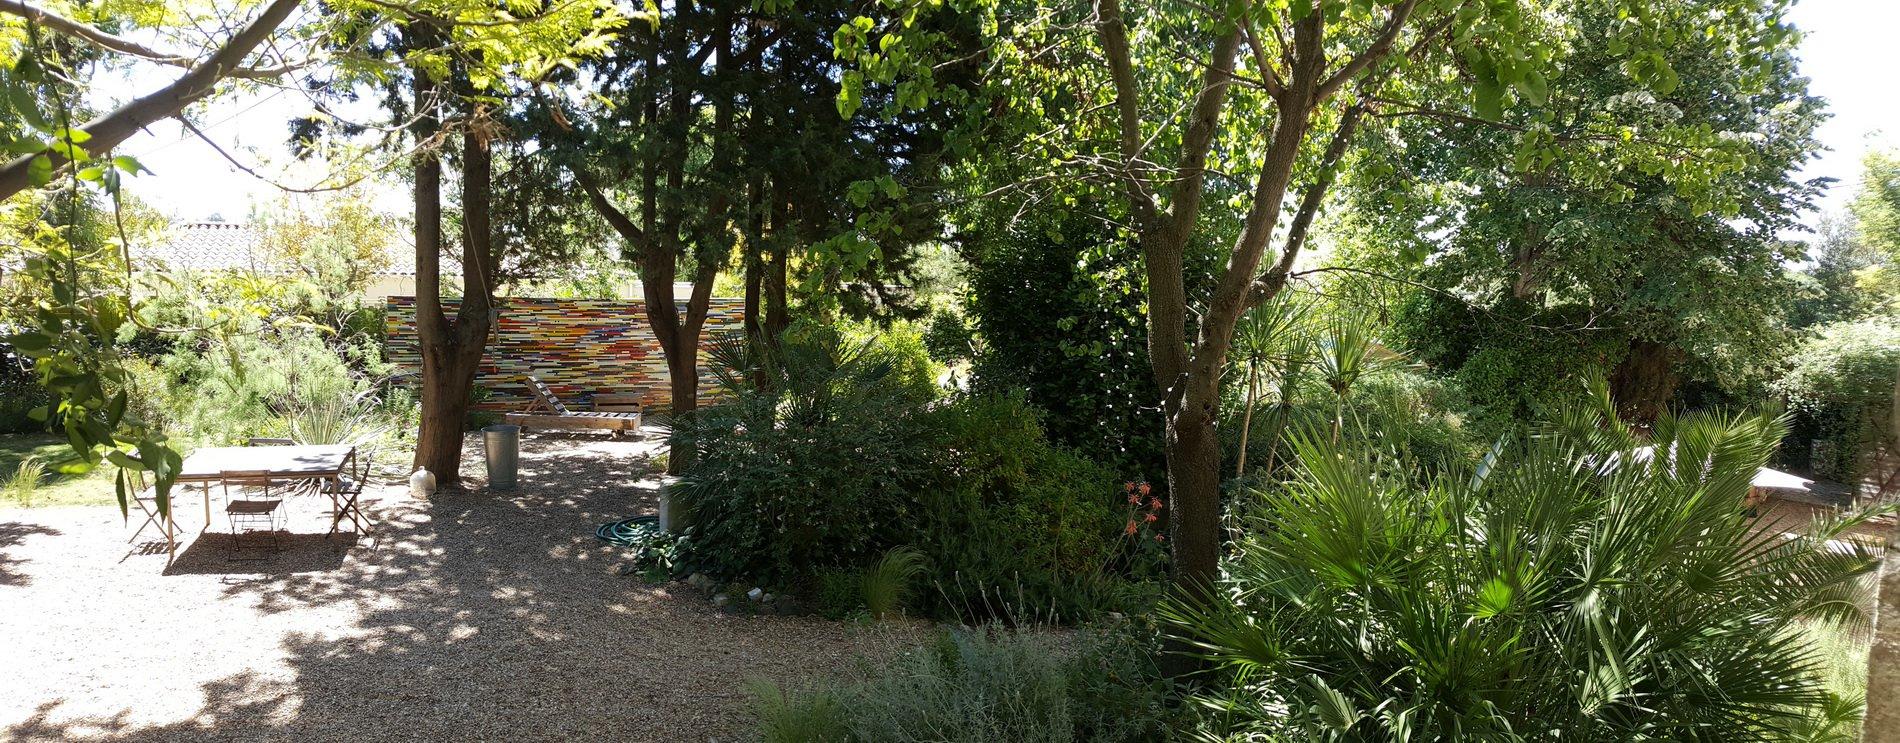 Ancien chai restauré avec grand jardin Mediterranean